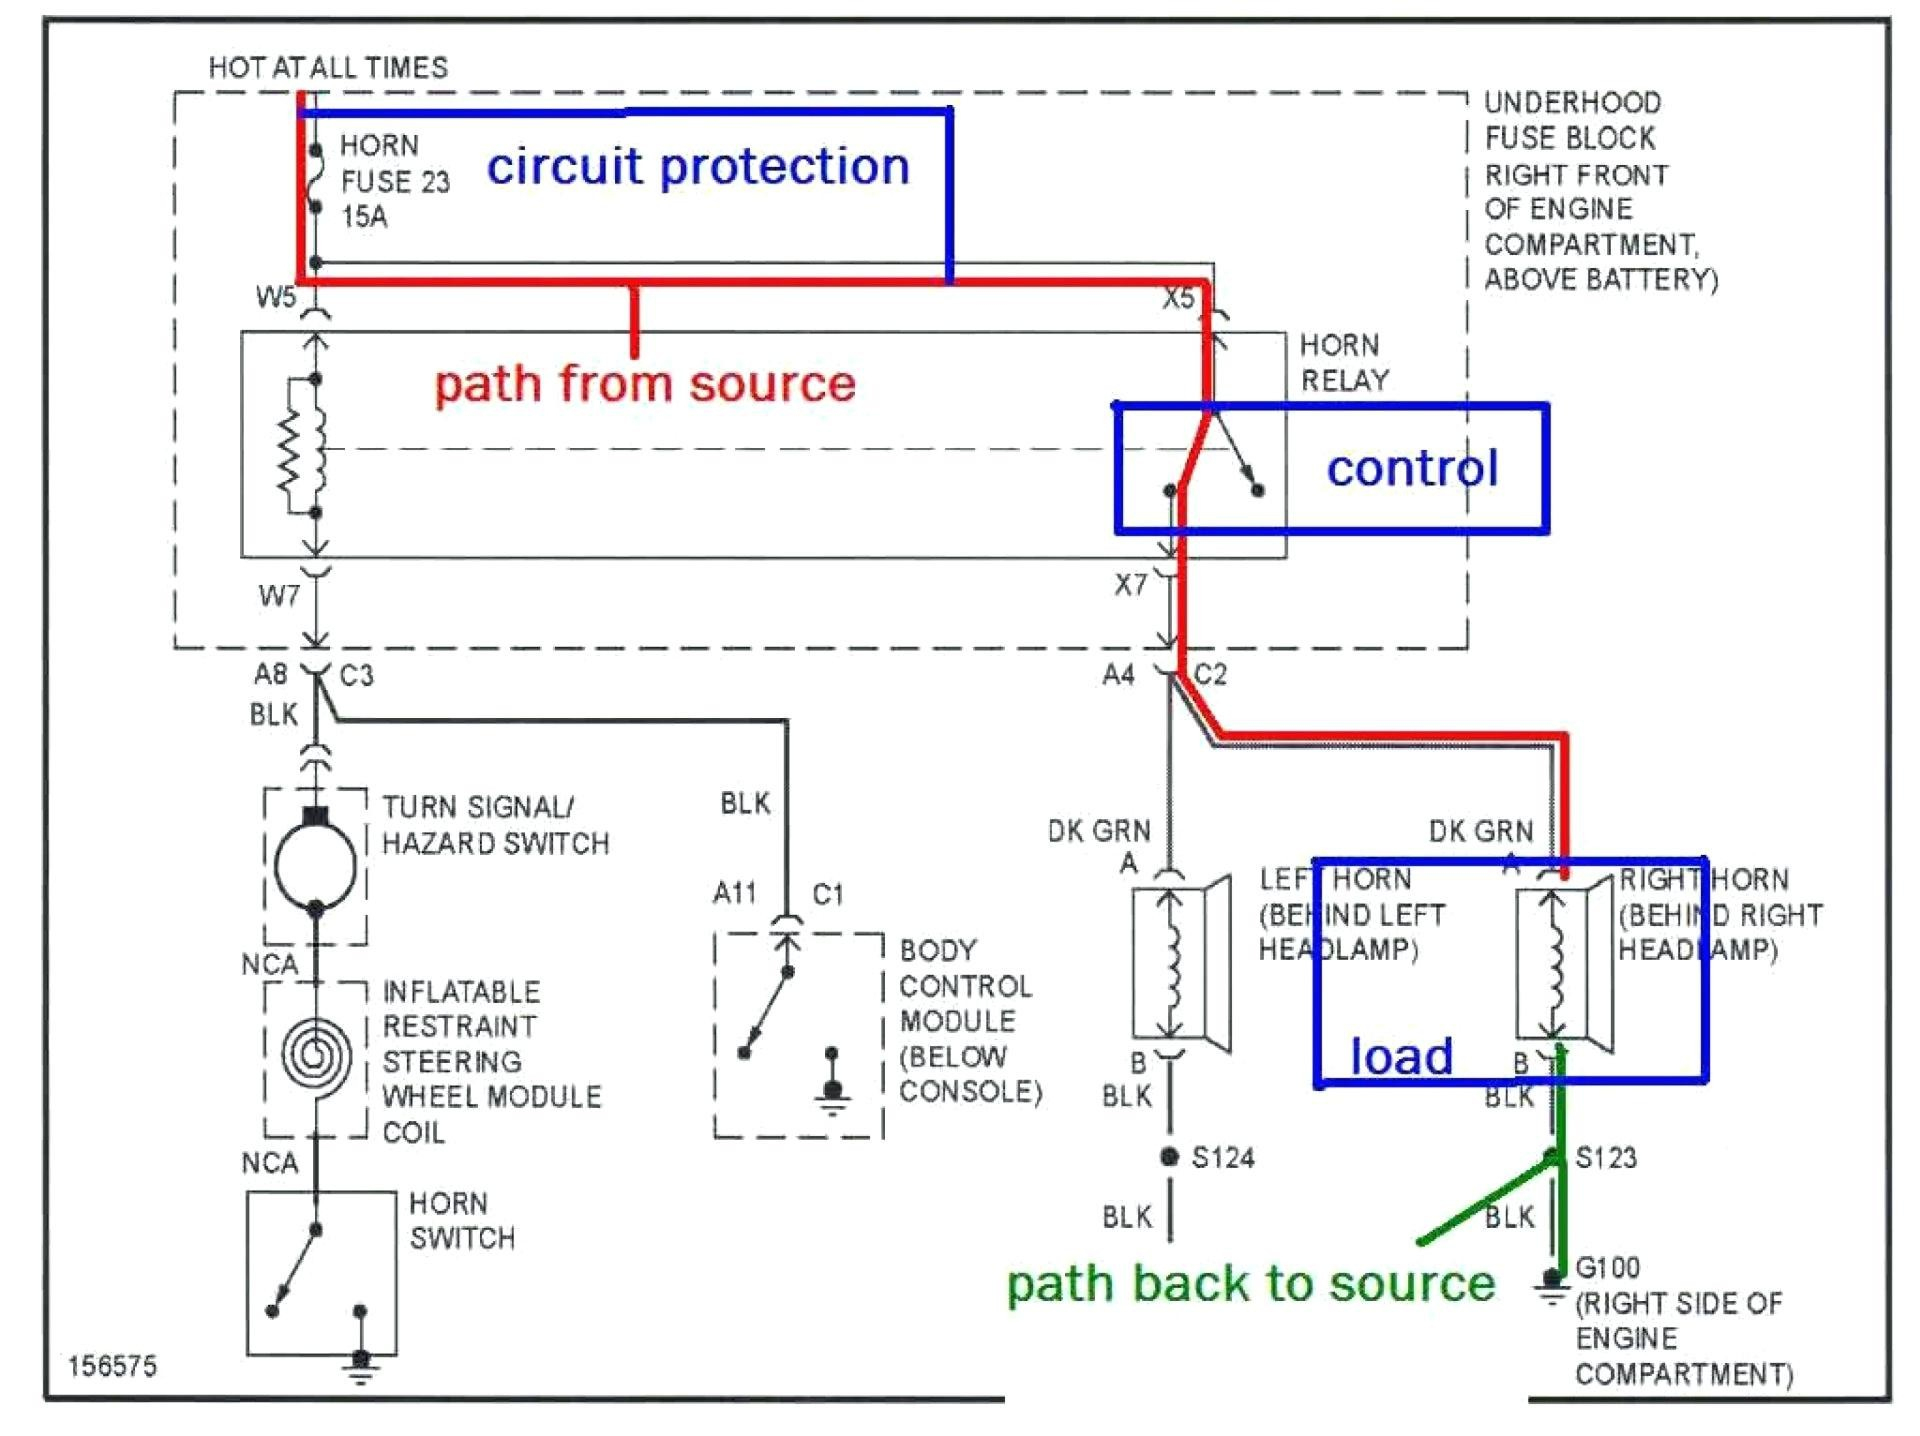 Pioneer Super Tuner Iii D Wiring Diagram | Wiring Diagram - Pioneer Super Tuner 3D Wiring Diagram